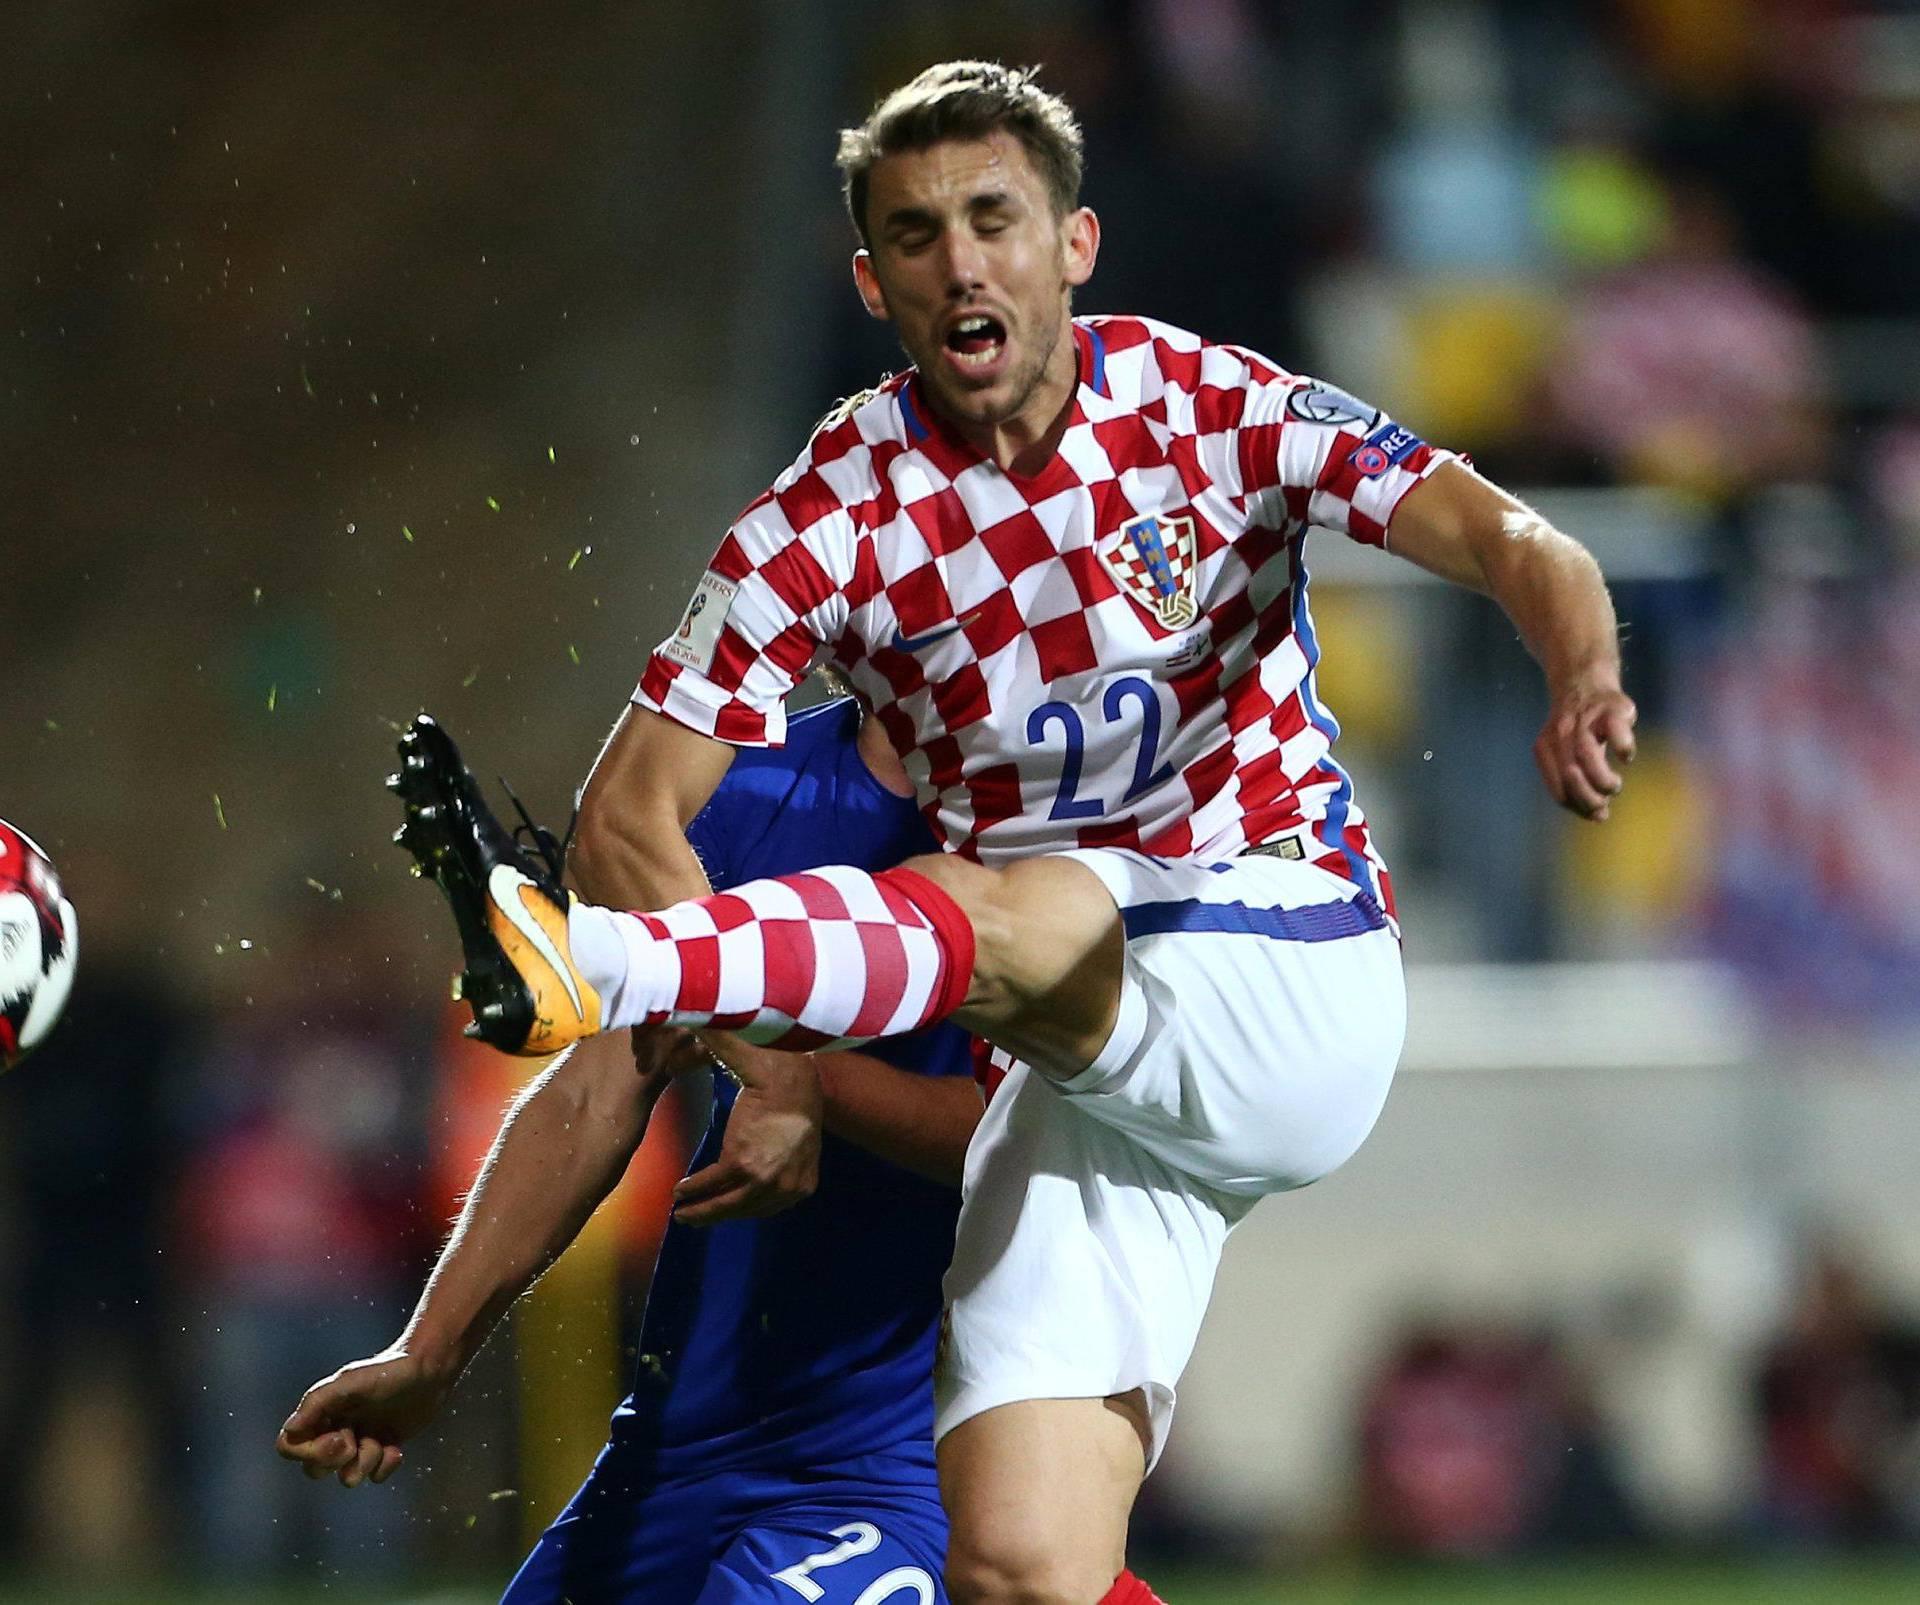 2018 World Cup Qualifications - Europe - Croatia vs Finland